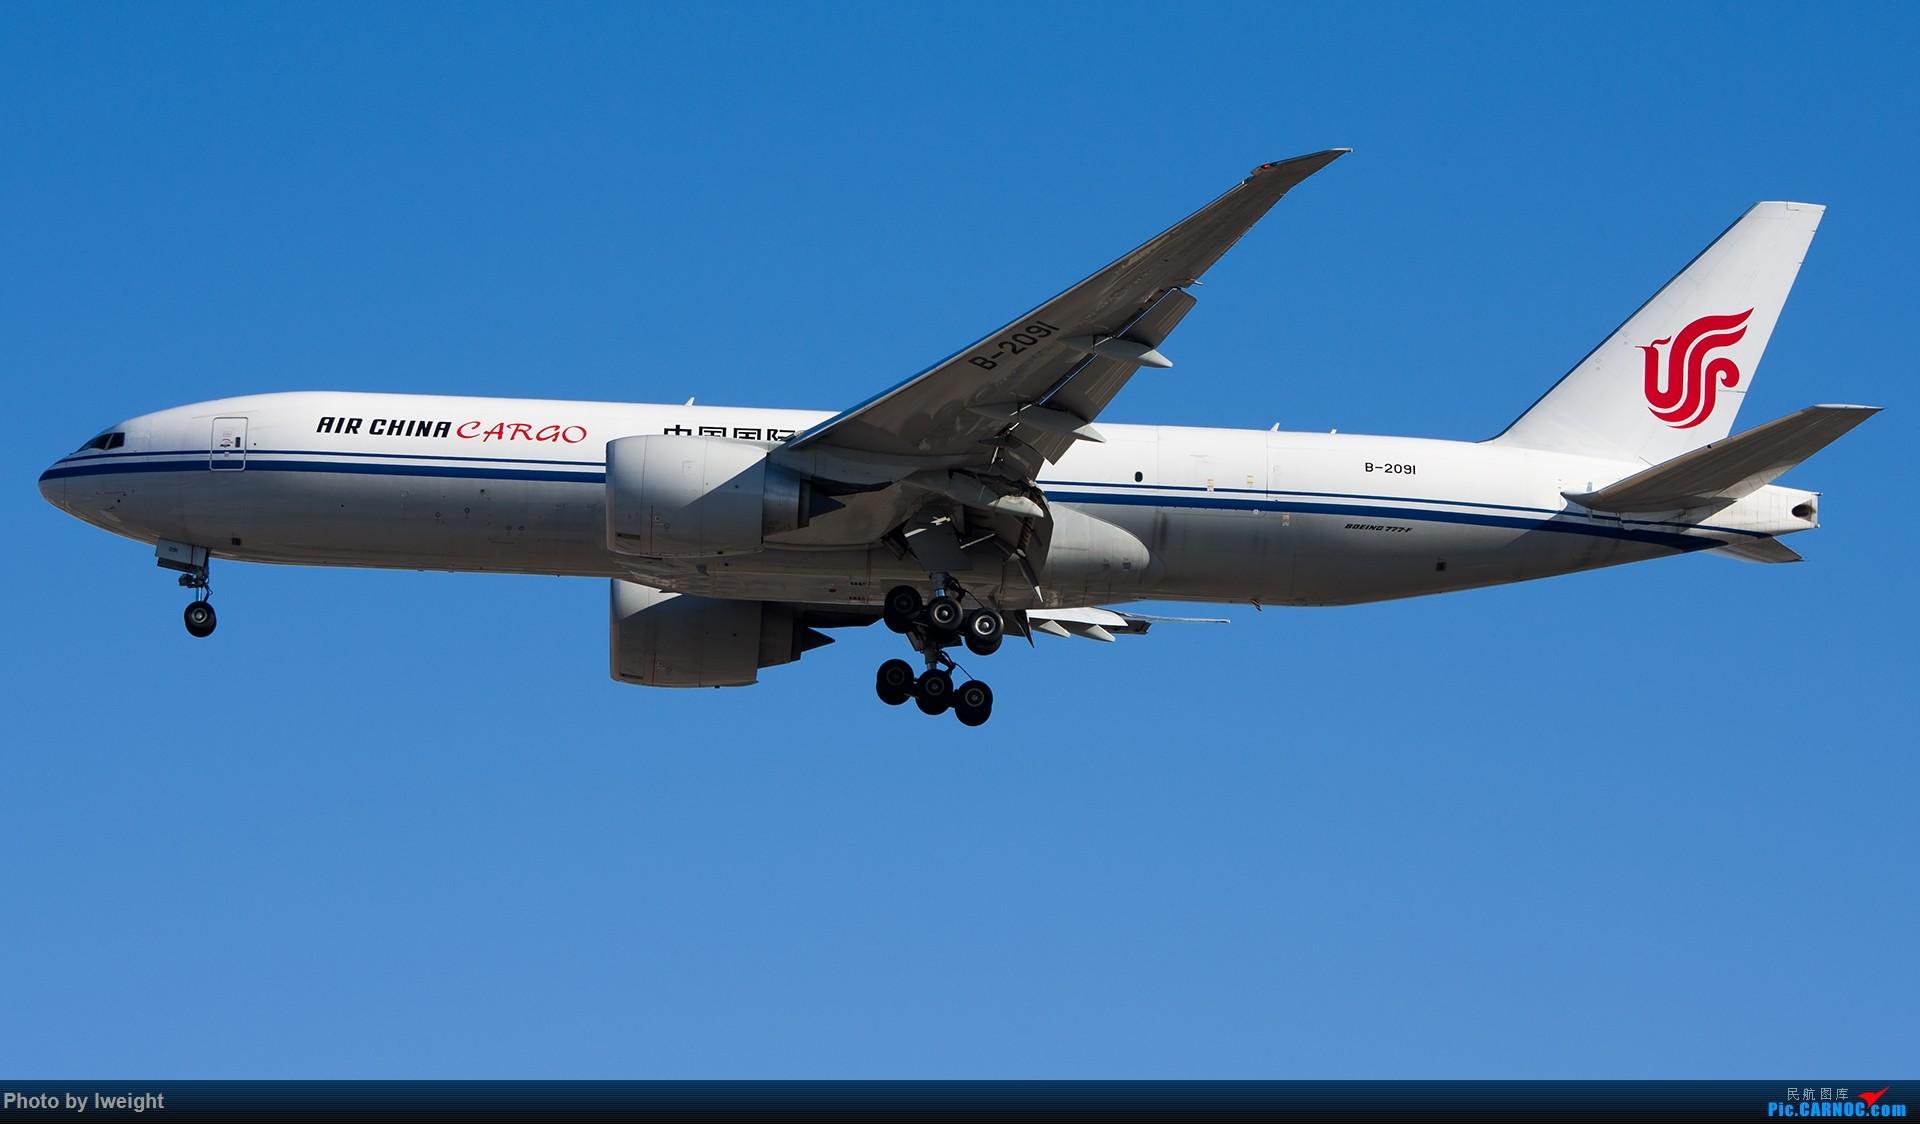 Re:[原创]终于在12月的北京等到了一个晴天的周末,出来拍拍飞机【2015-12-5】 BOEING 777-200 B-2091 中国北京首都国际机场